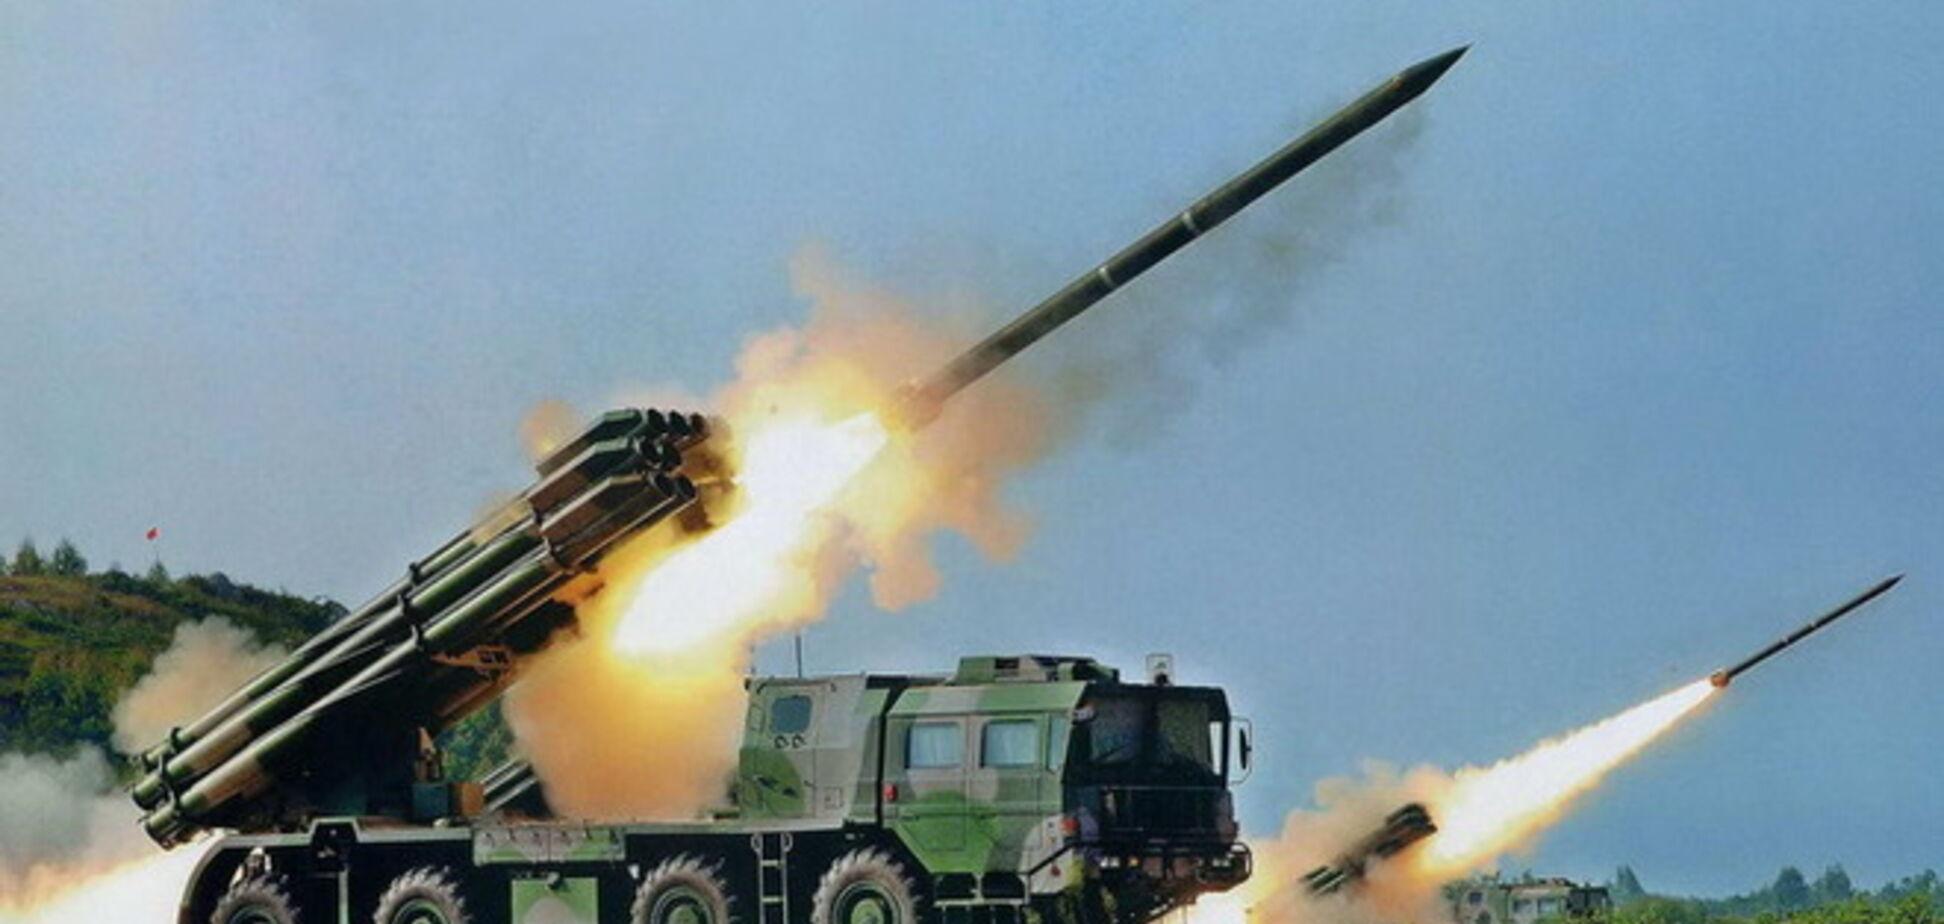 Краматорськ обстріляли чотири 'Смерча' - Генштаб